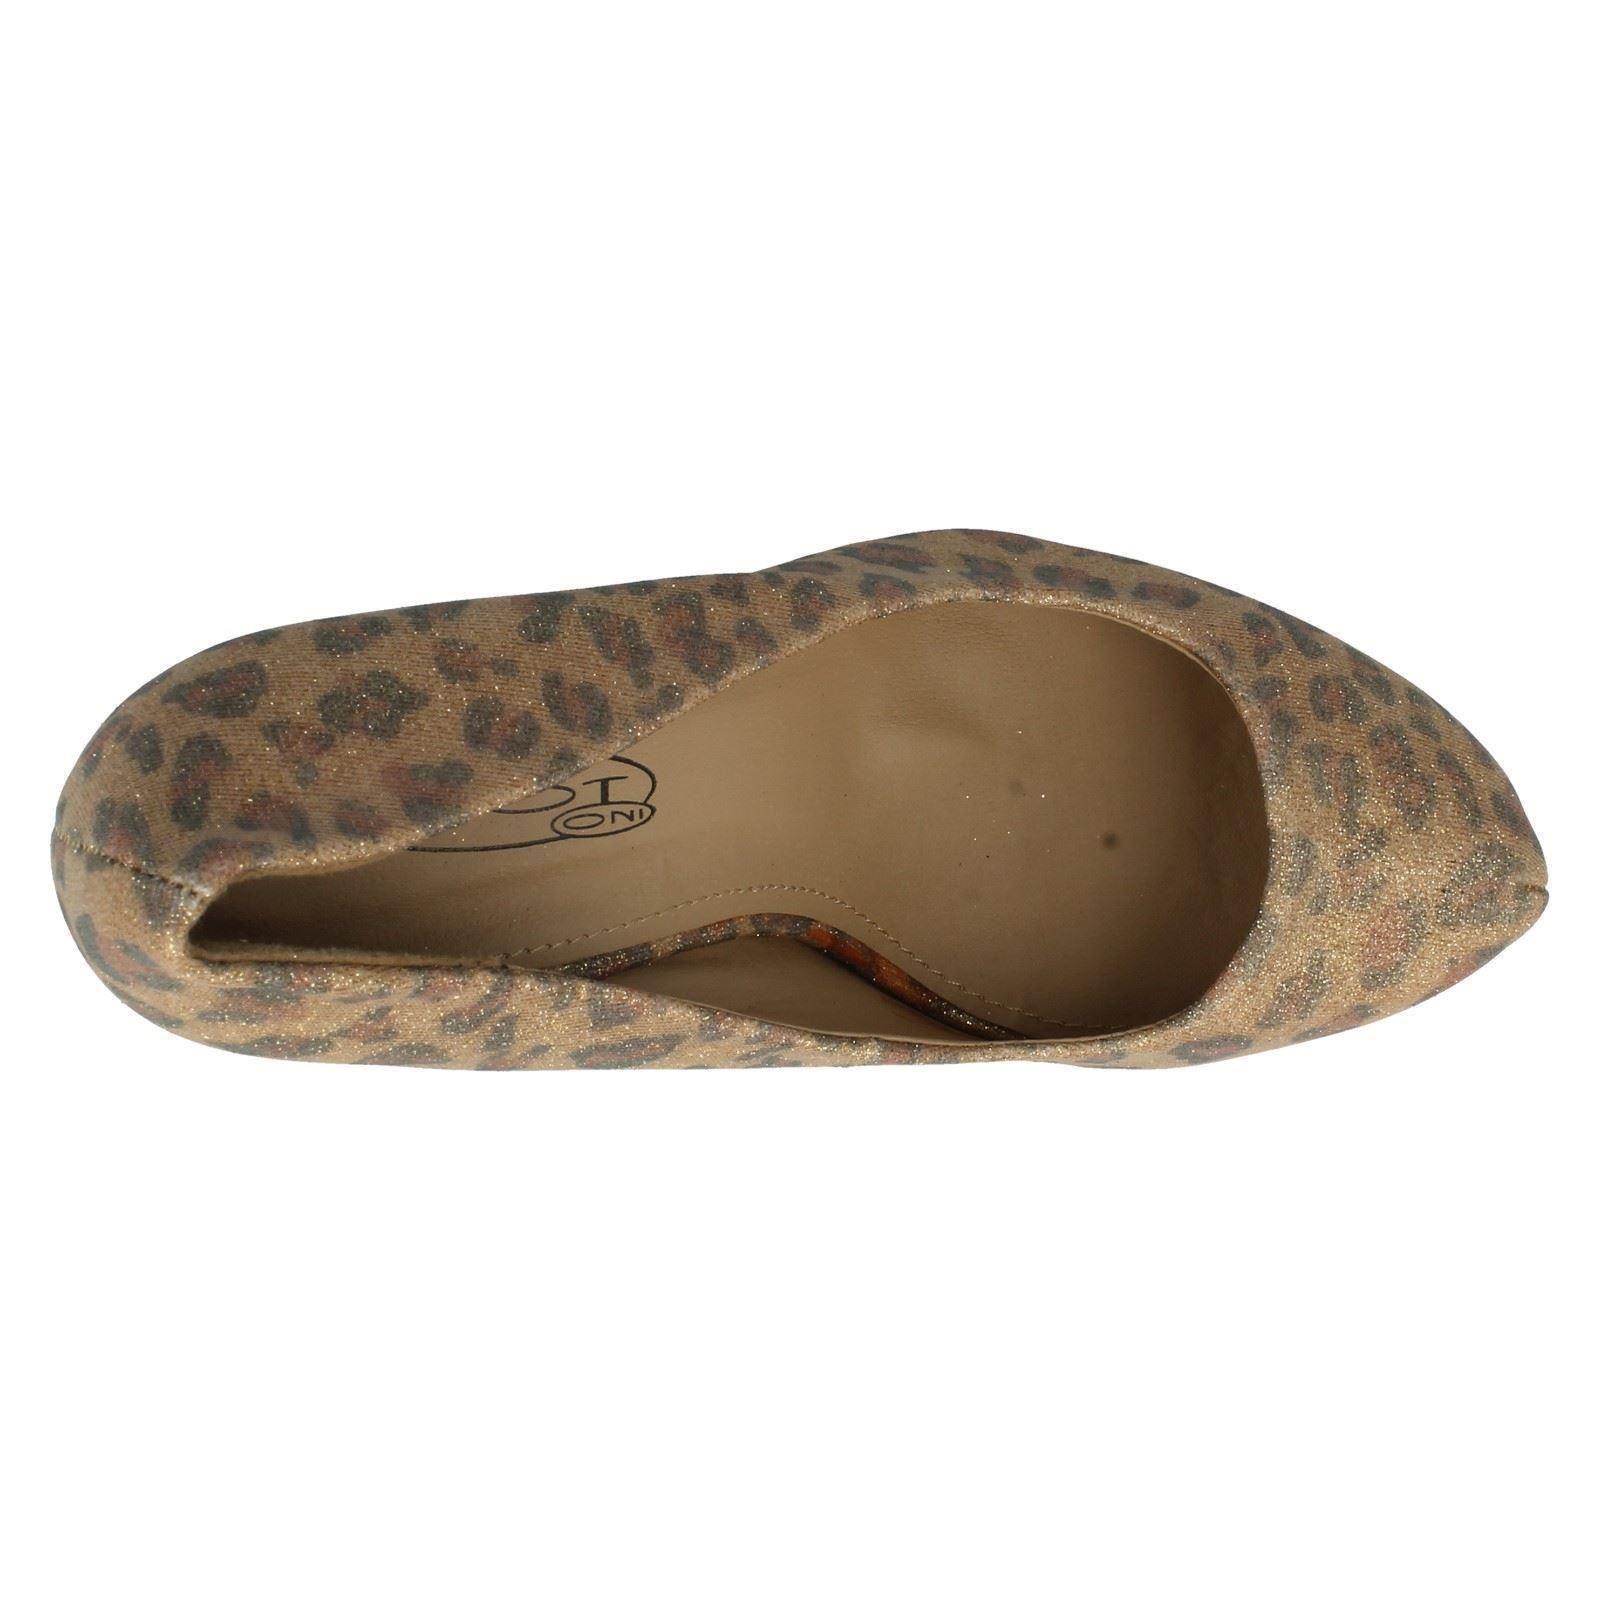 Señoras de punto en Zapatos Etiqueta f9556